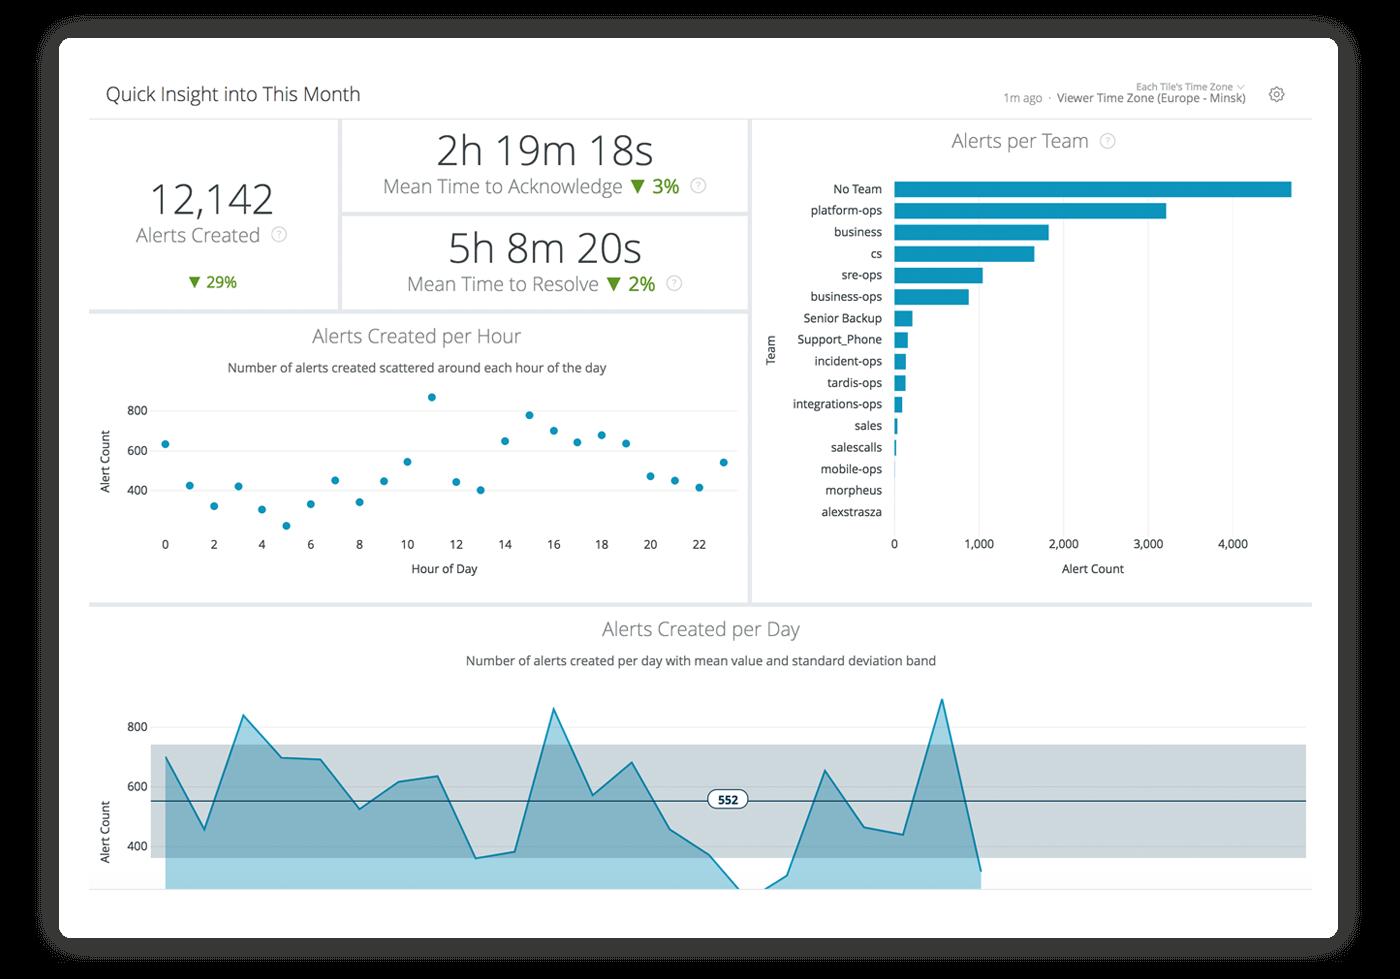 Snapshot dell'analisi della panoramica mensile